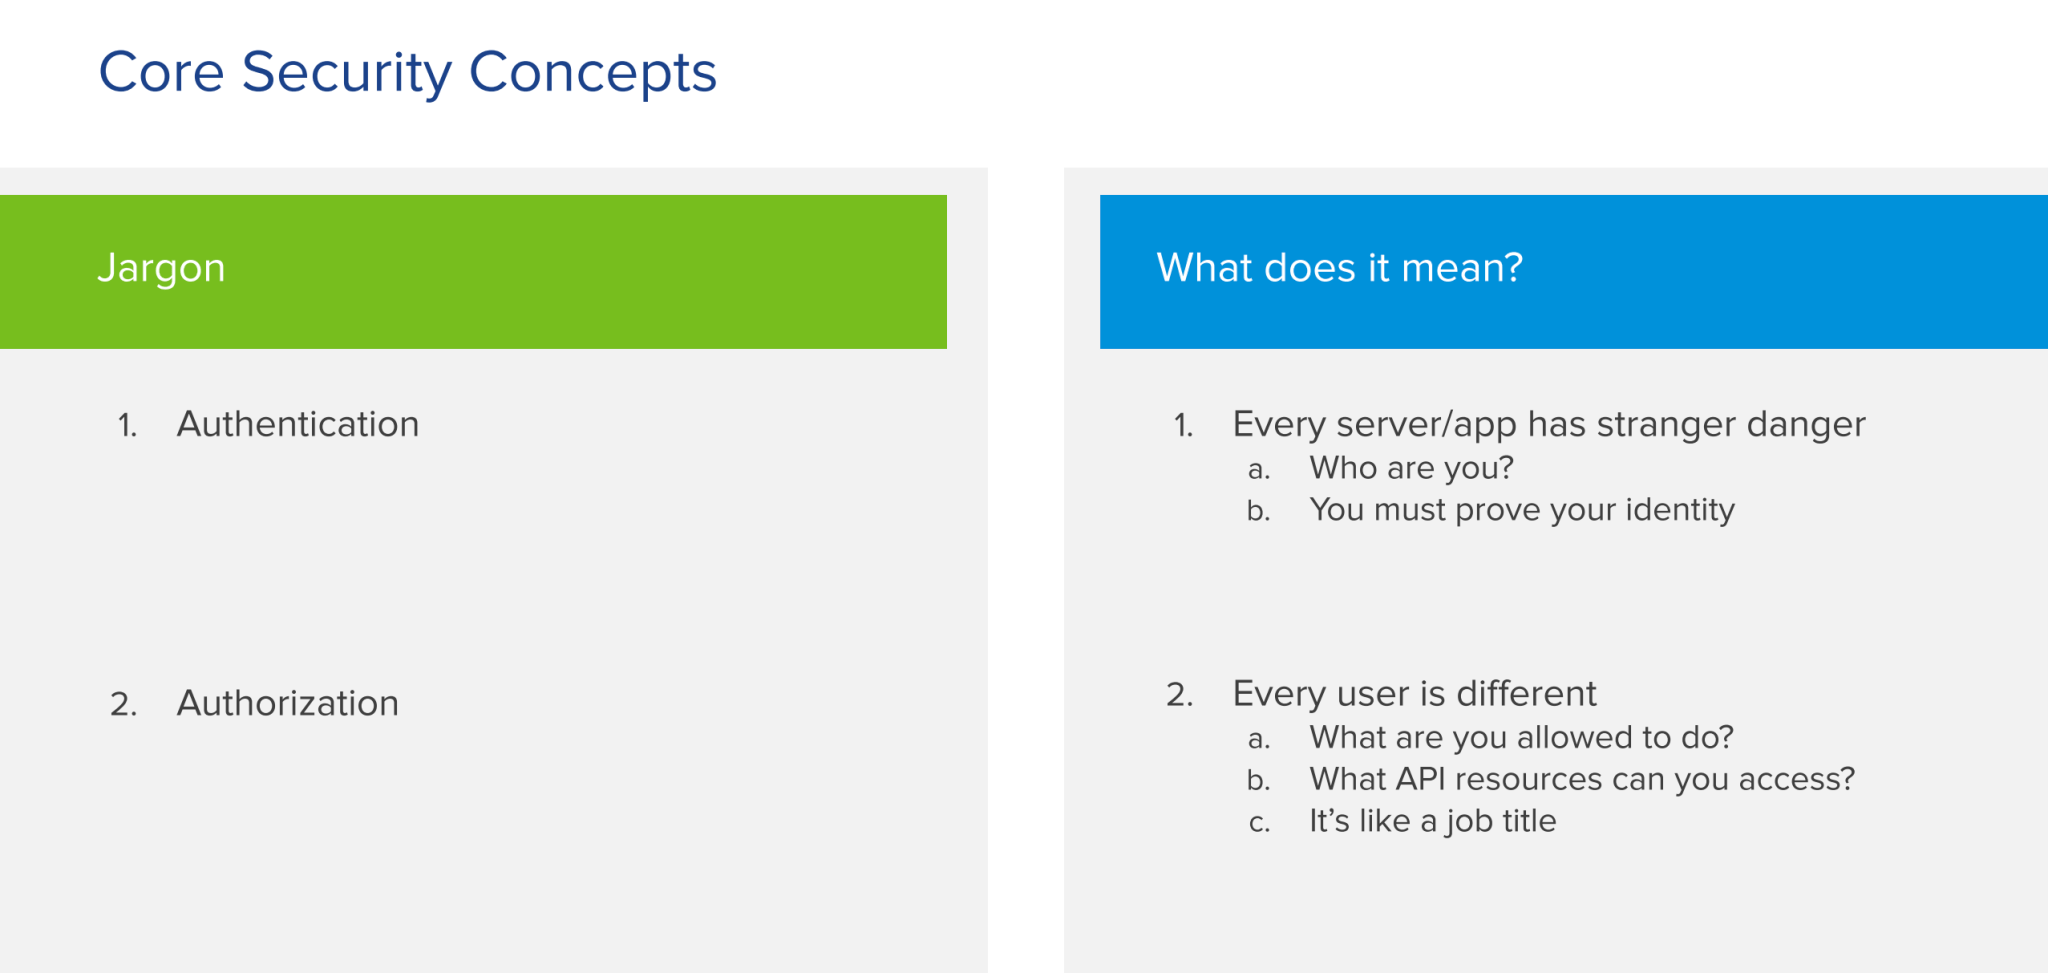 Core Security Concepts